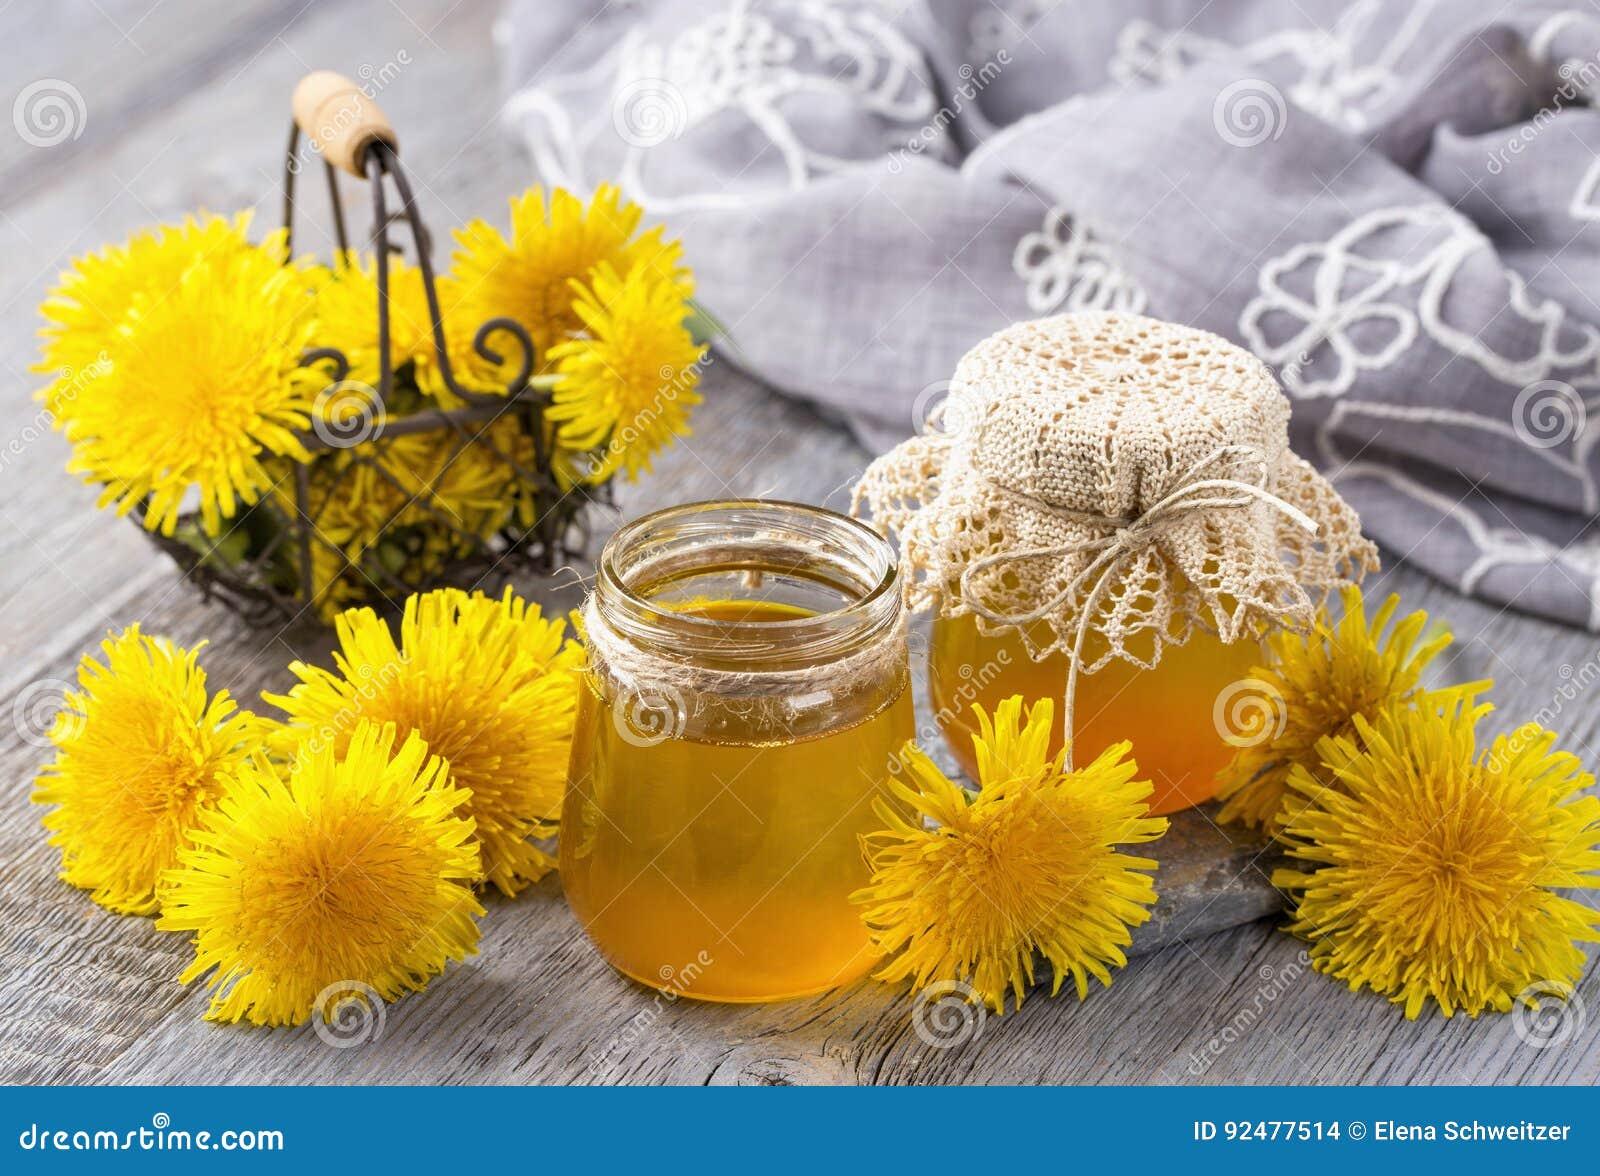 https://thumbs.dreamstime.com/z/dandelion-honey-jar-fresh-flowers-92477514.jpg